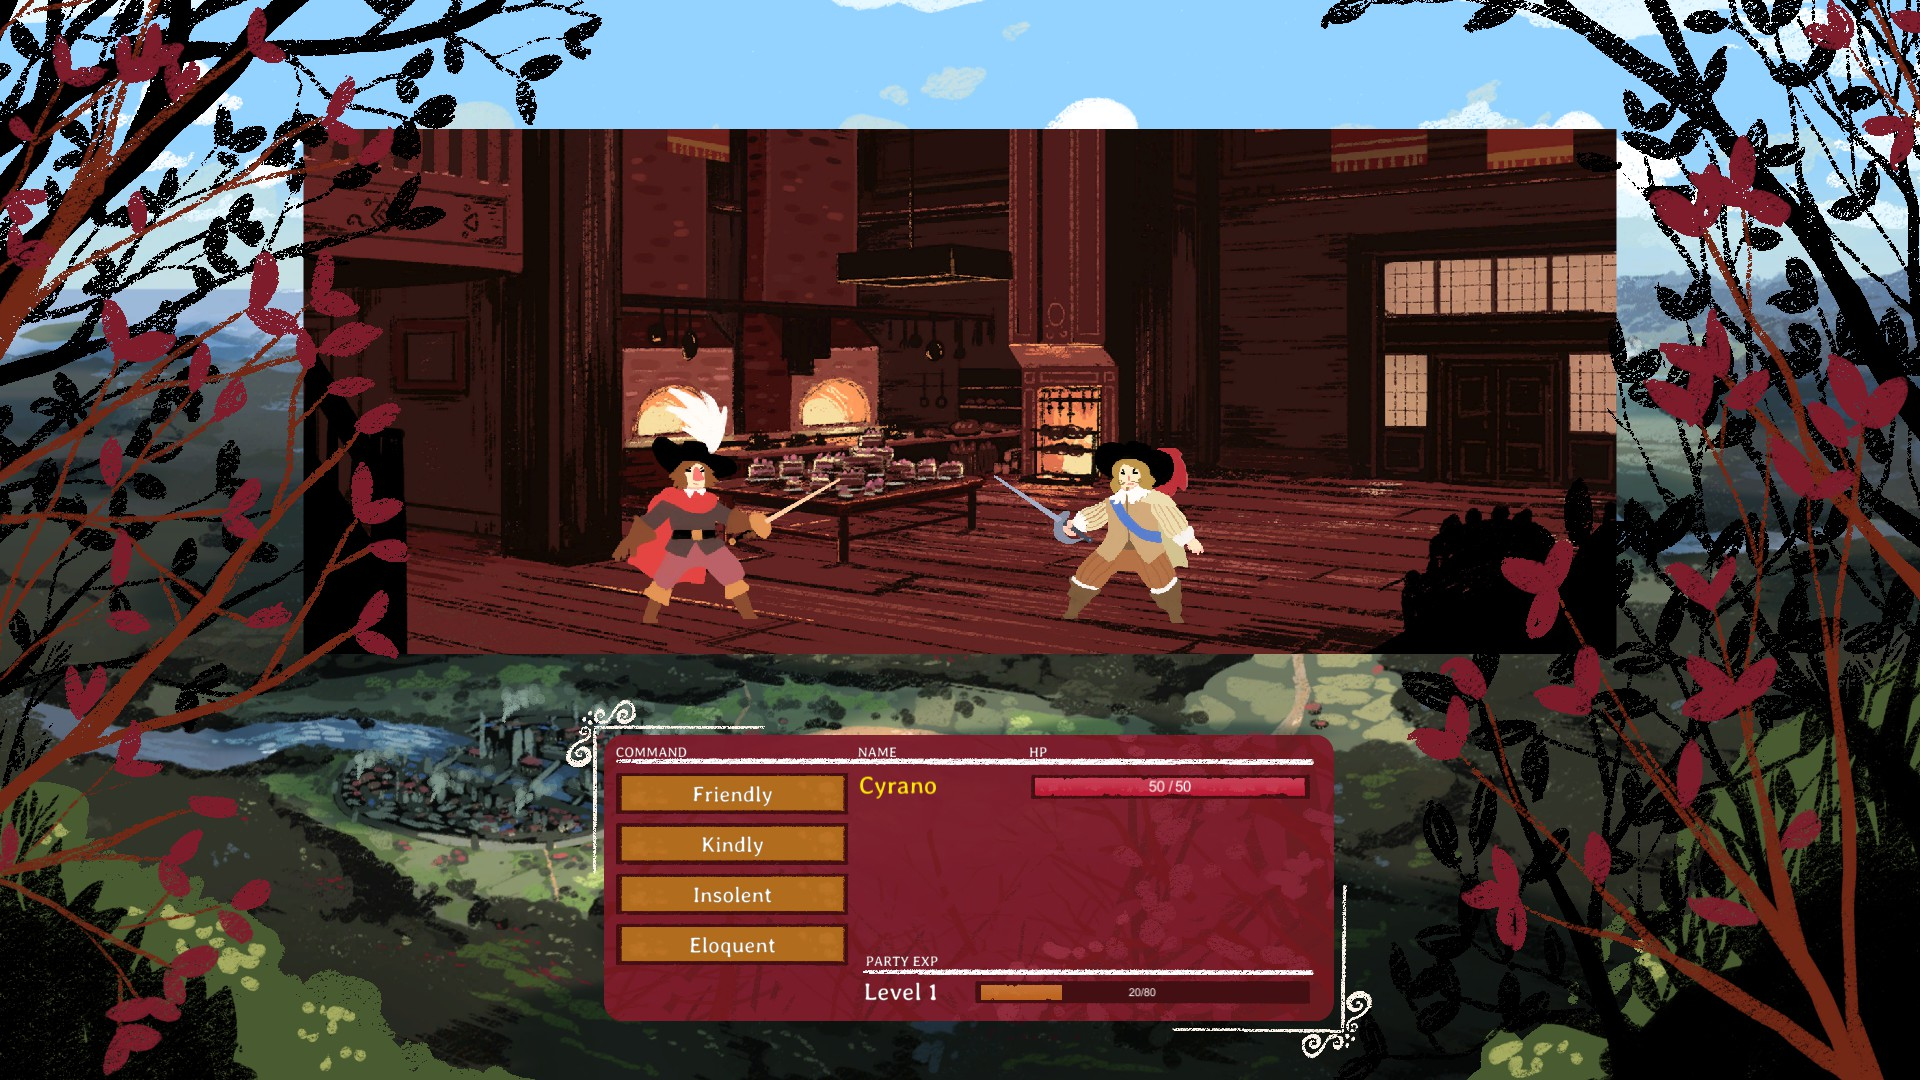 Cyrano - Combat